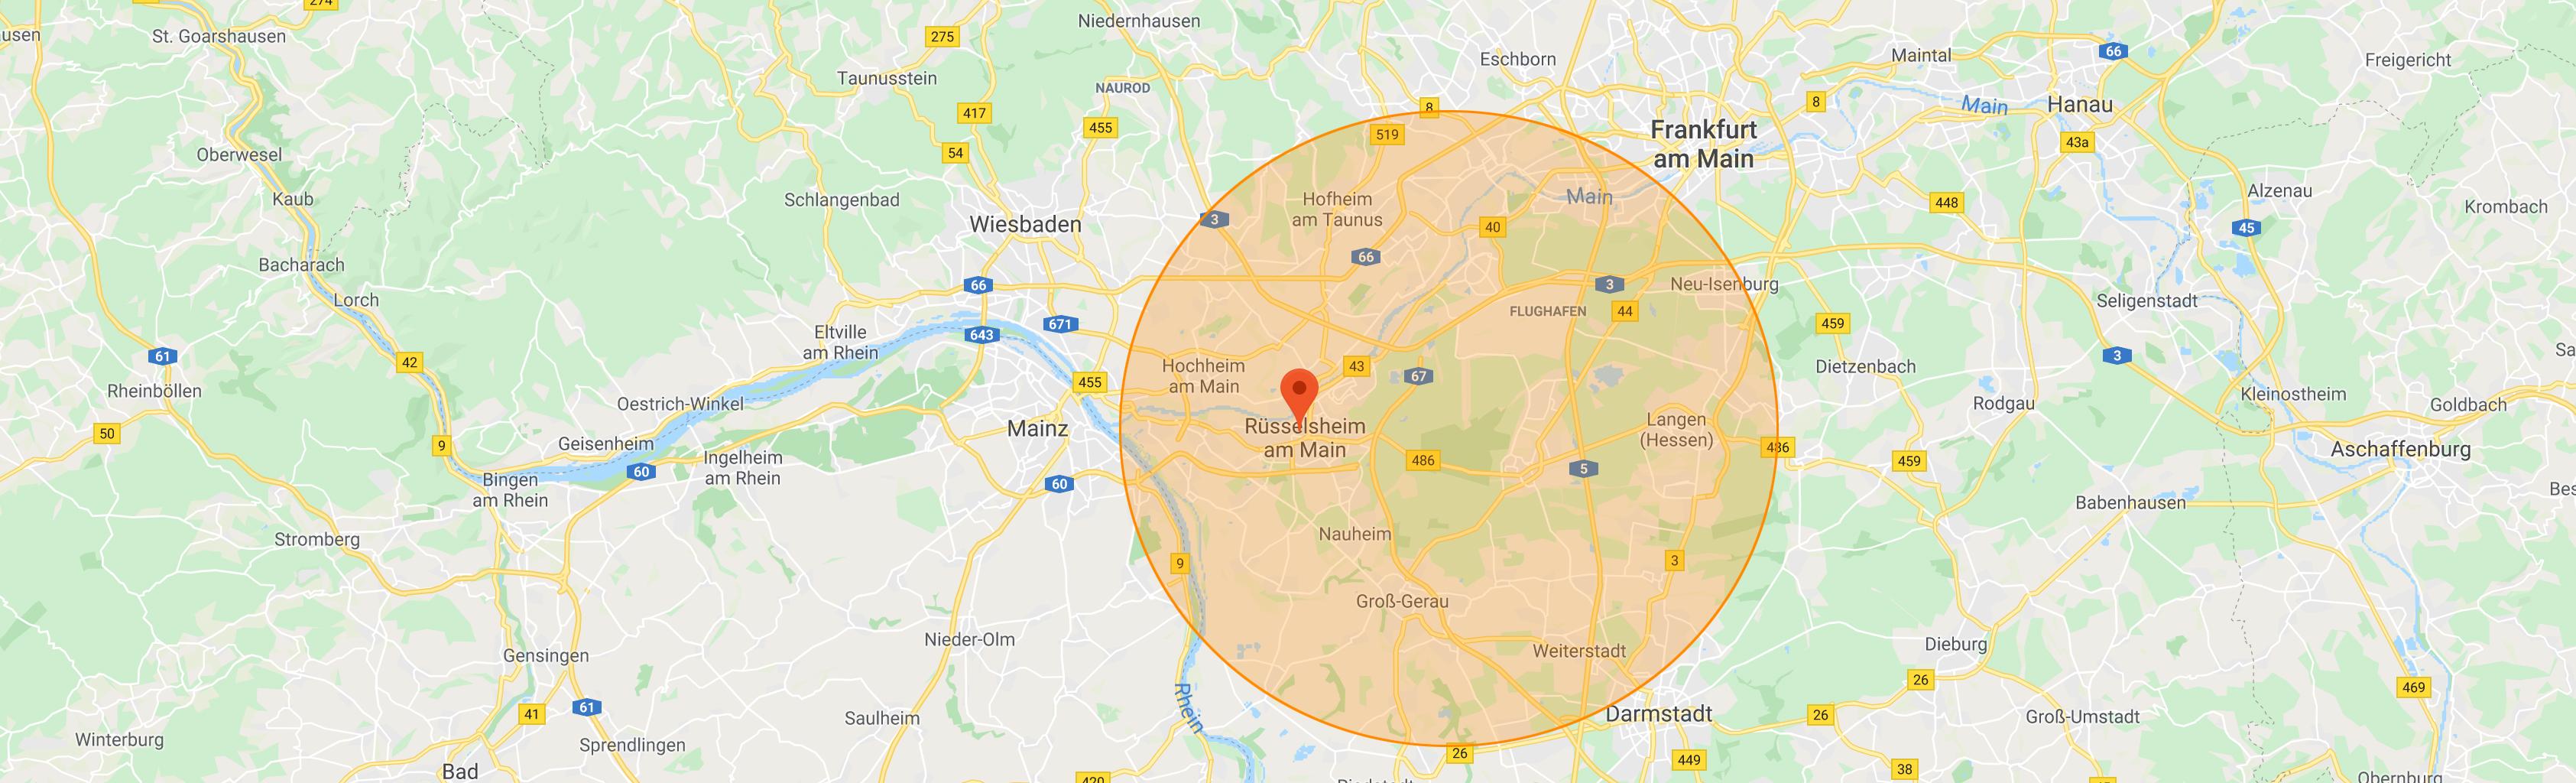 Karte_TobiBergmann